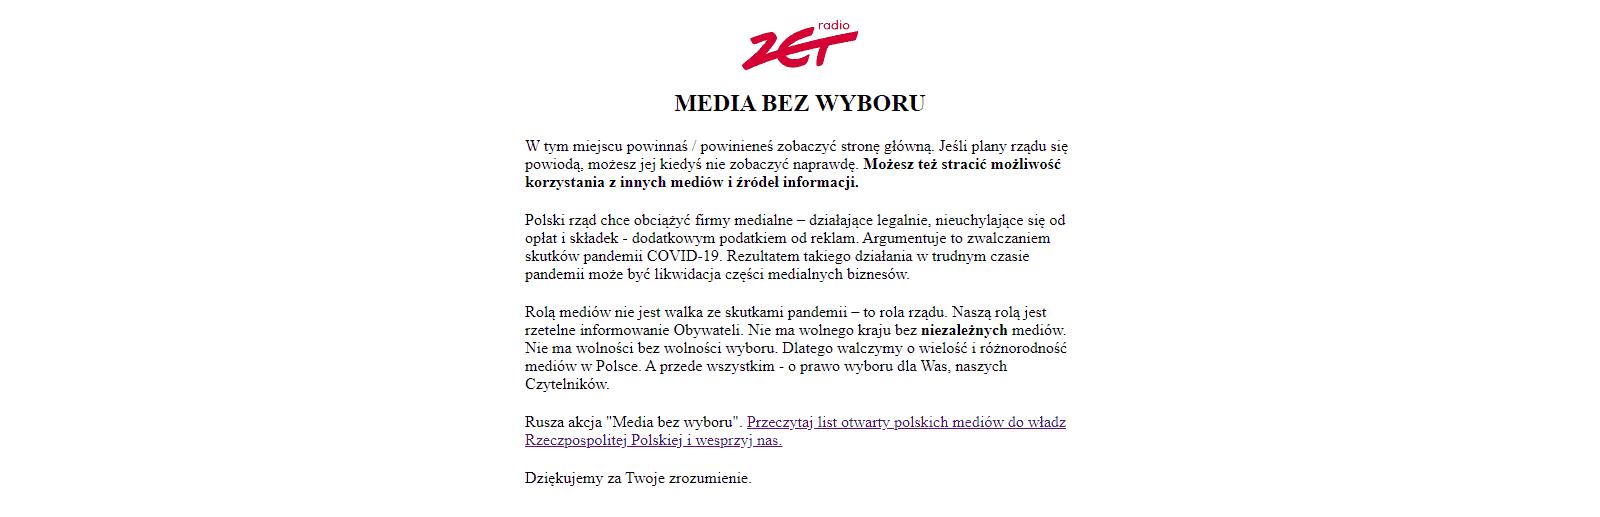 Zrzut ekranu radiozet.pl - protest mediów